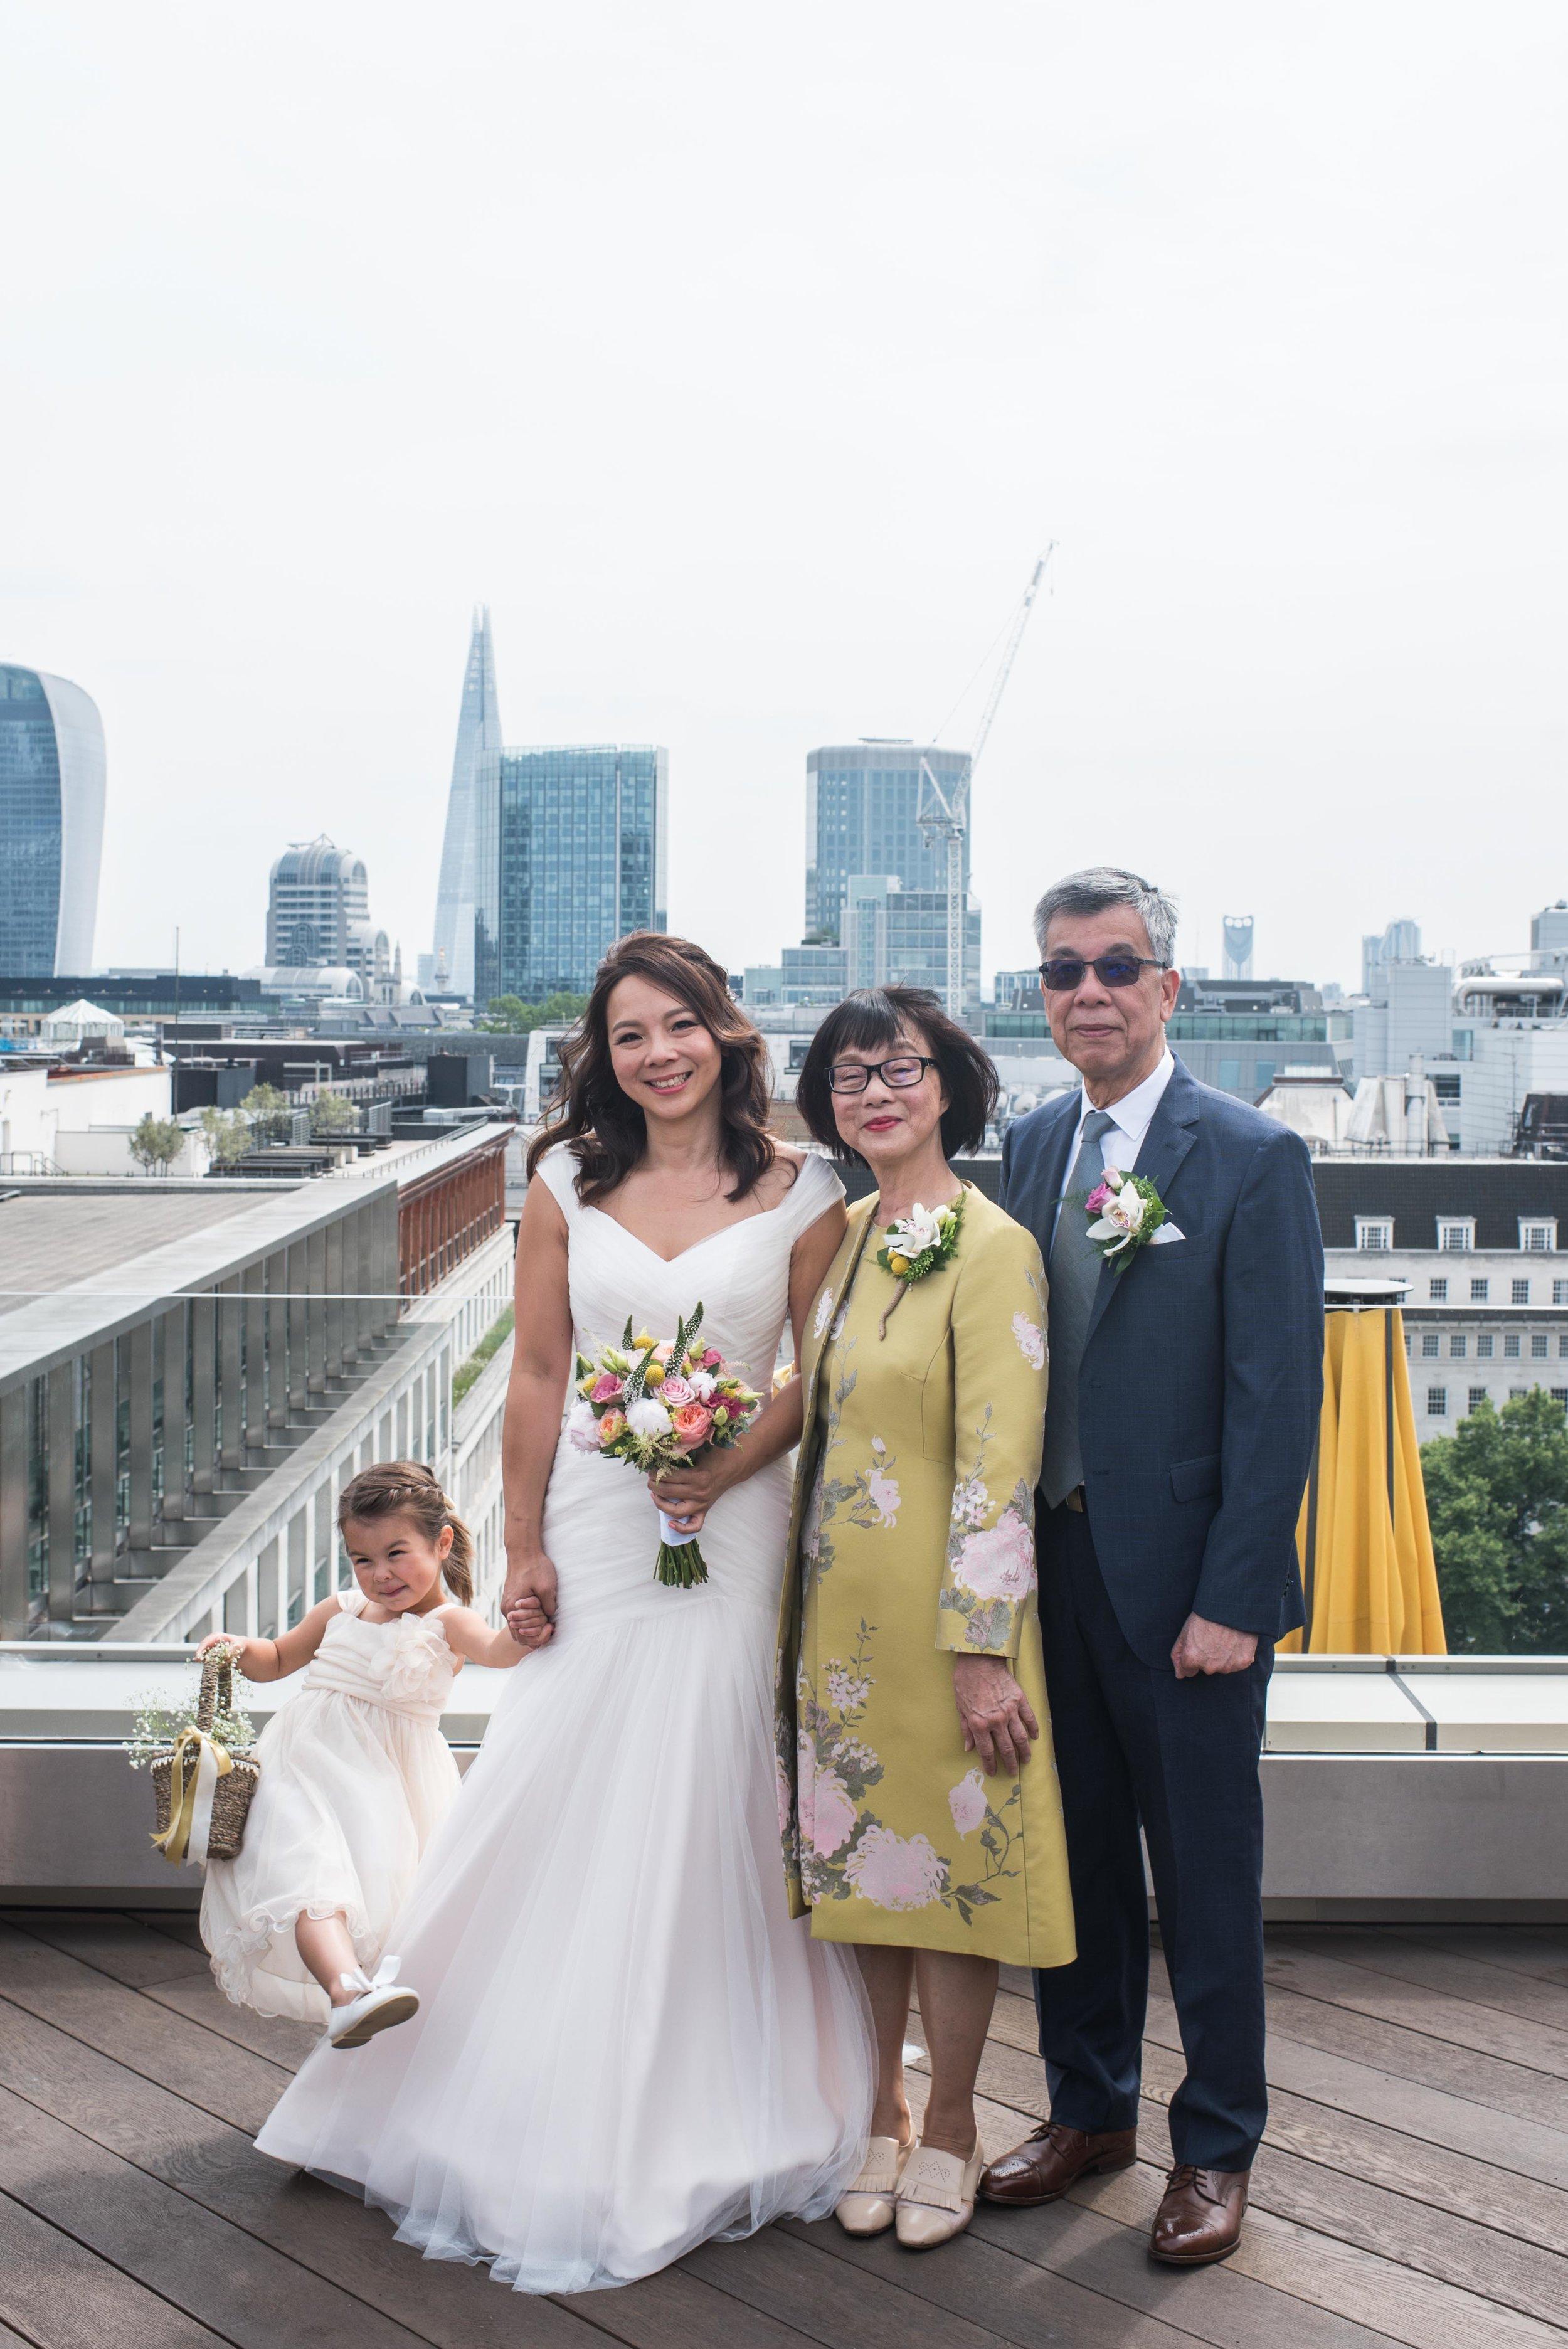 D&M_Marylebone Town Hall Wedding (35 of 239).jpg